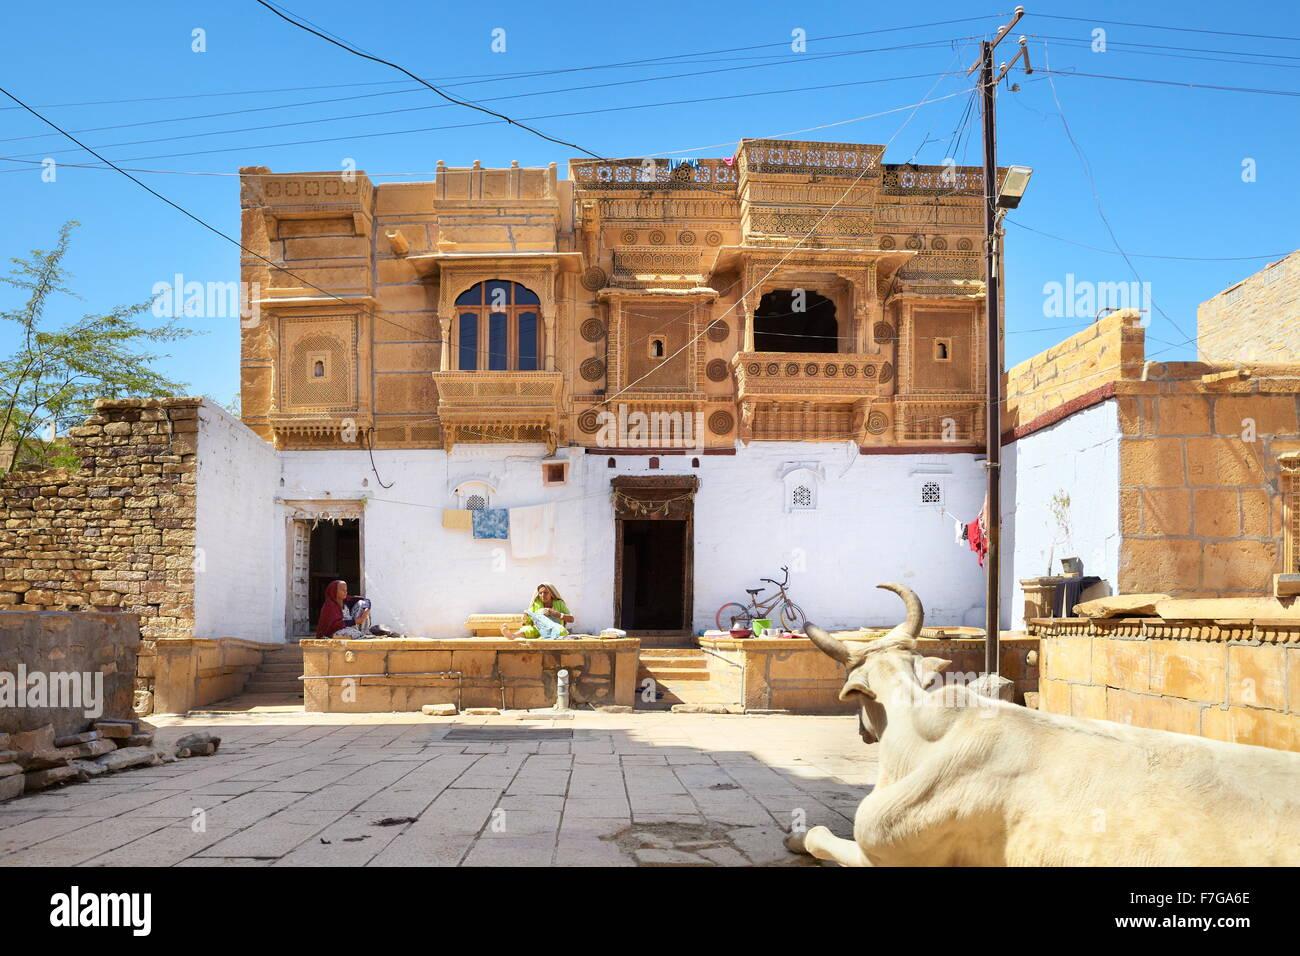 Traditional india old haveli (mansion) in Jaisalmer Fort, Jaisalmer, India - Stock Image